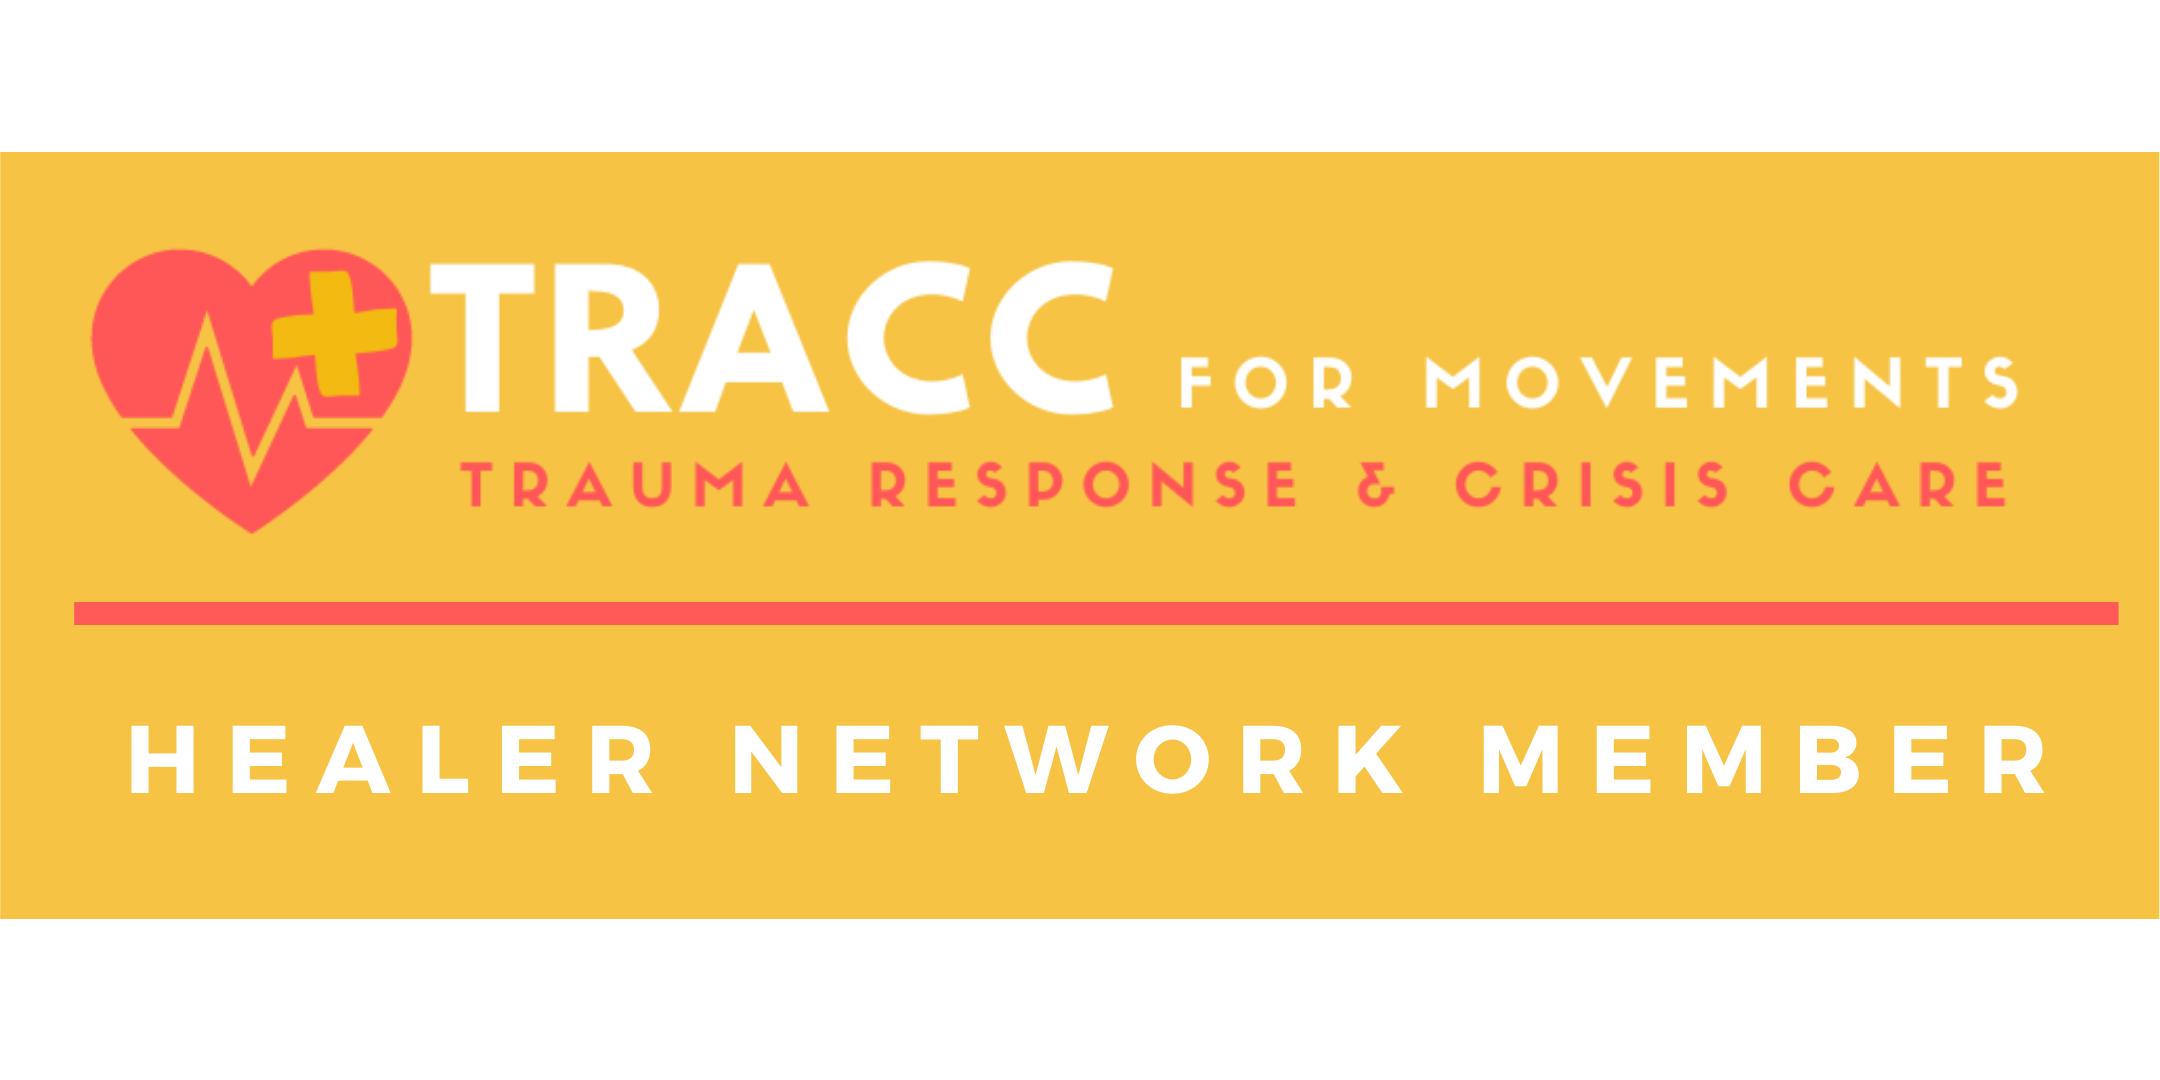 TRACC4 Movements Healer Network